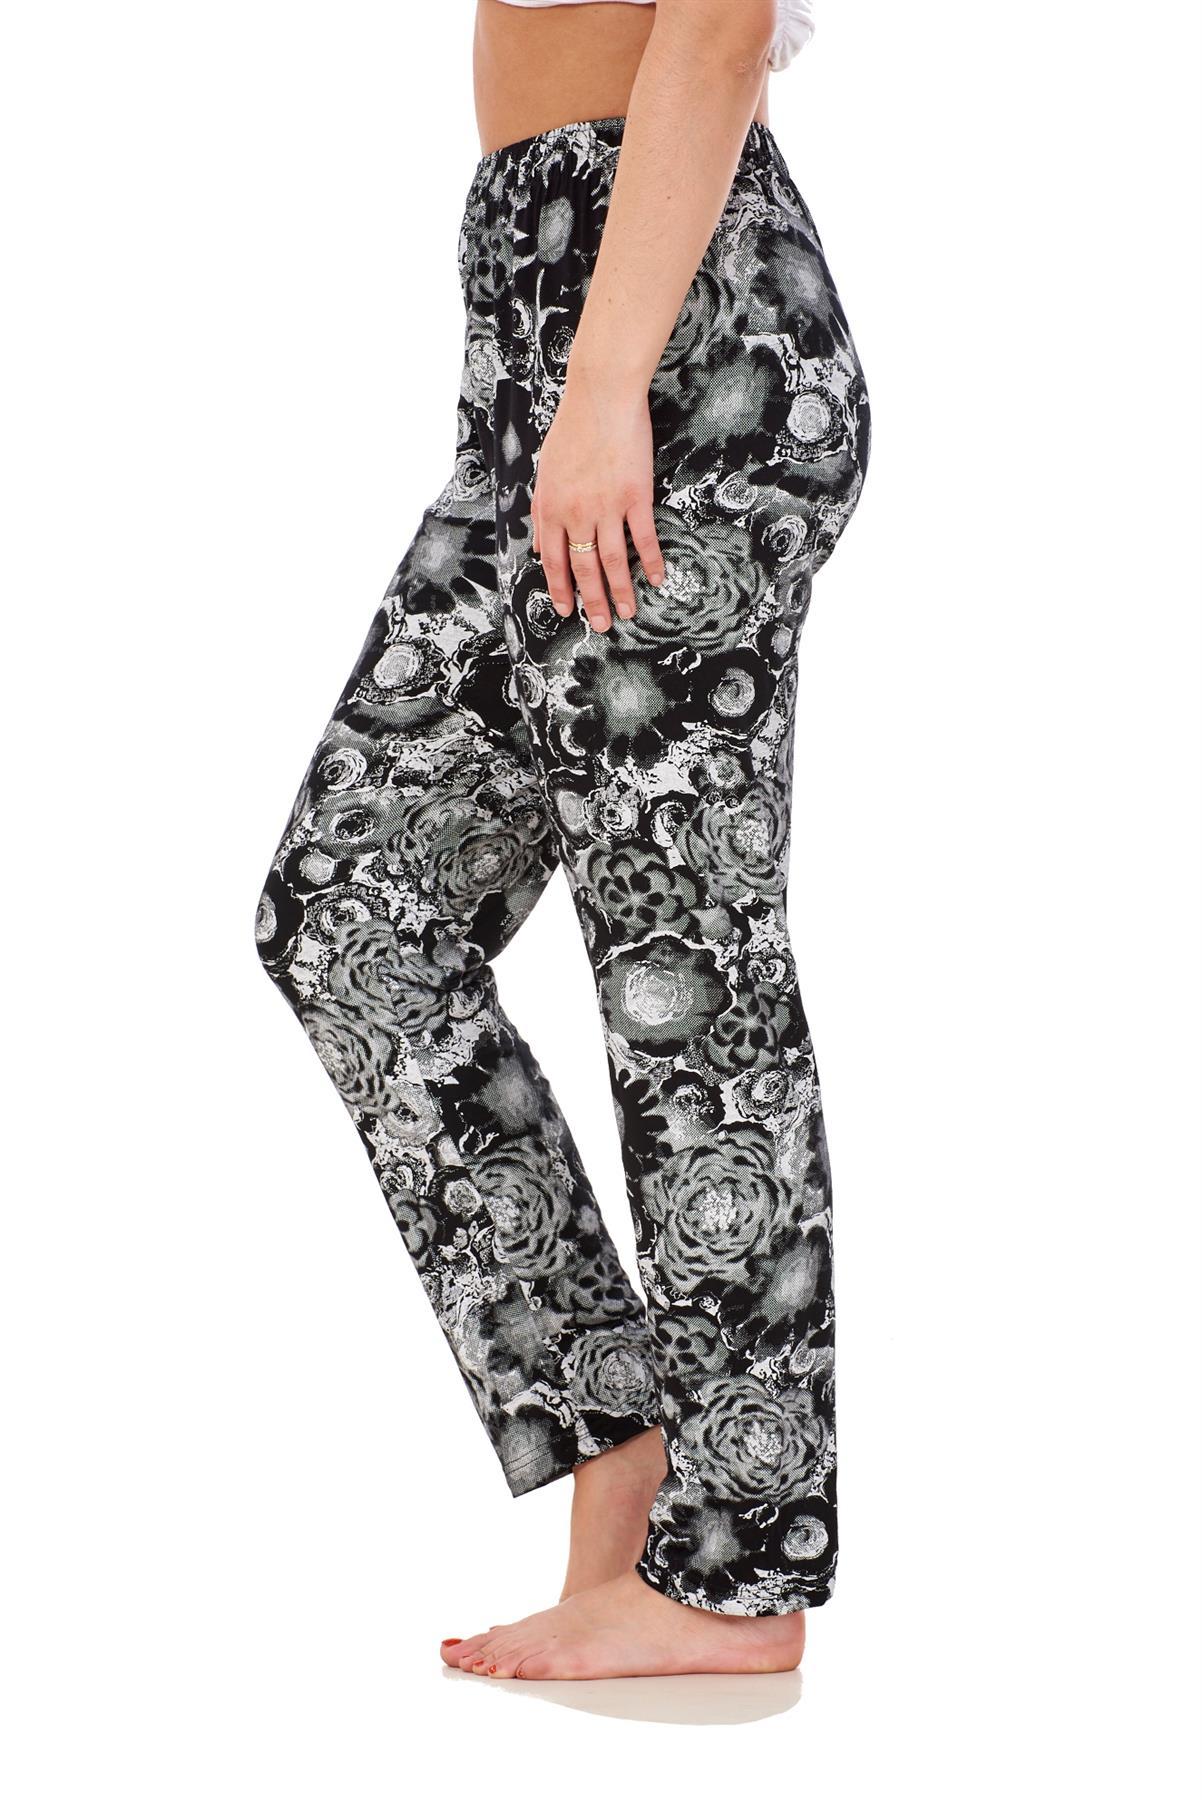 Ladies-Women-Trouser-Elasticated-Printed-Tapered-Harem-High-waist-Regular-Pants thumbnail 3